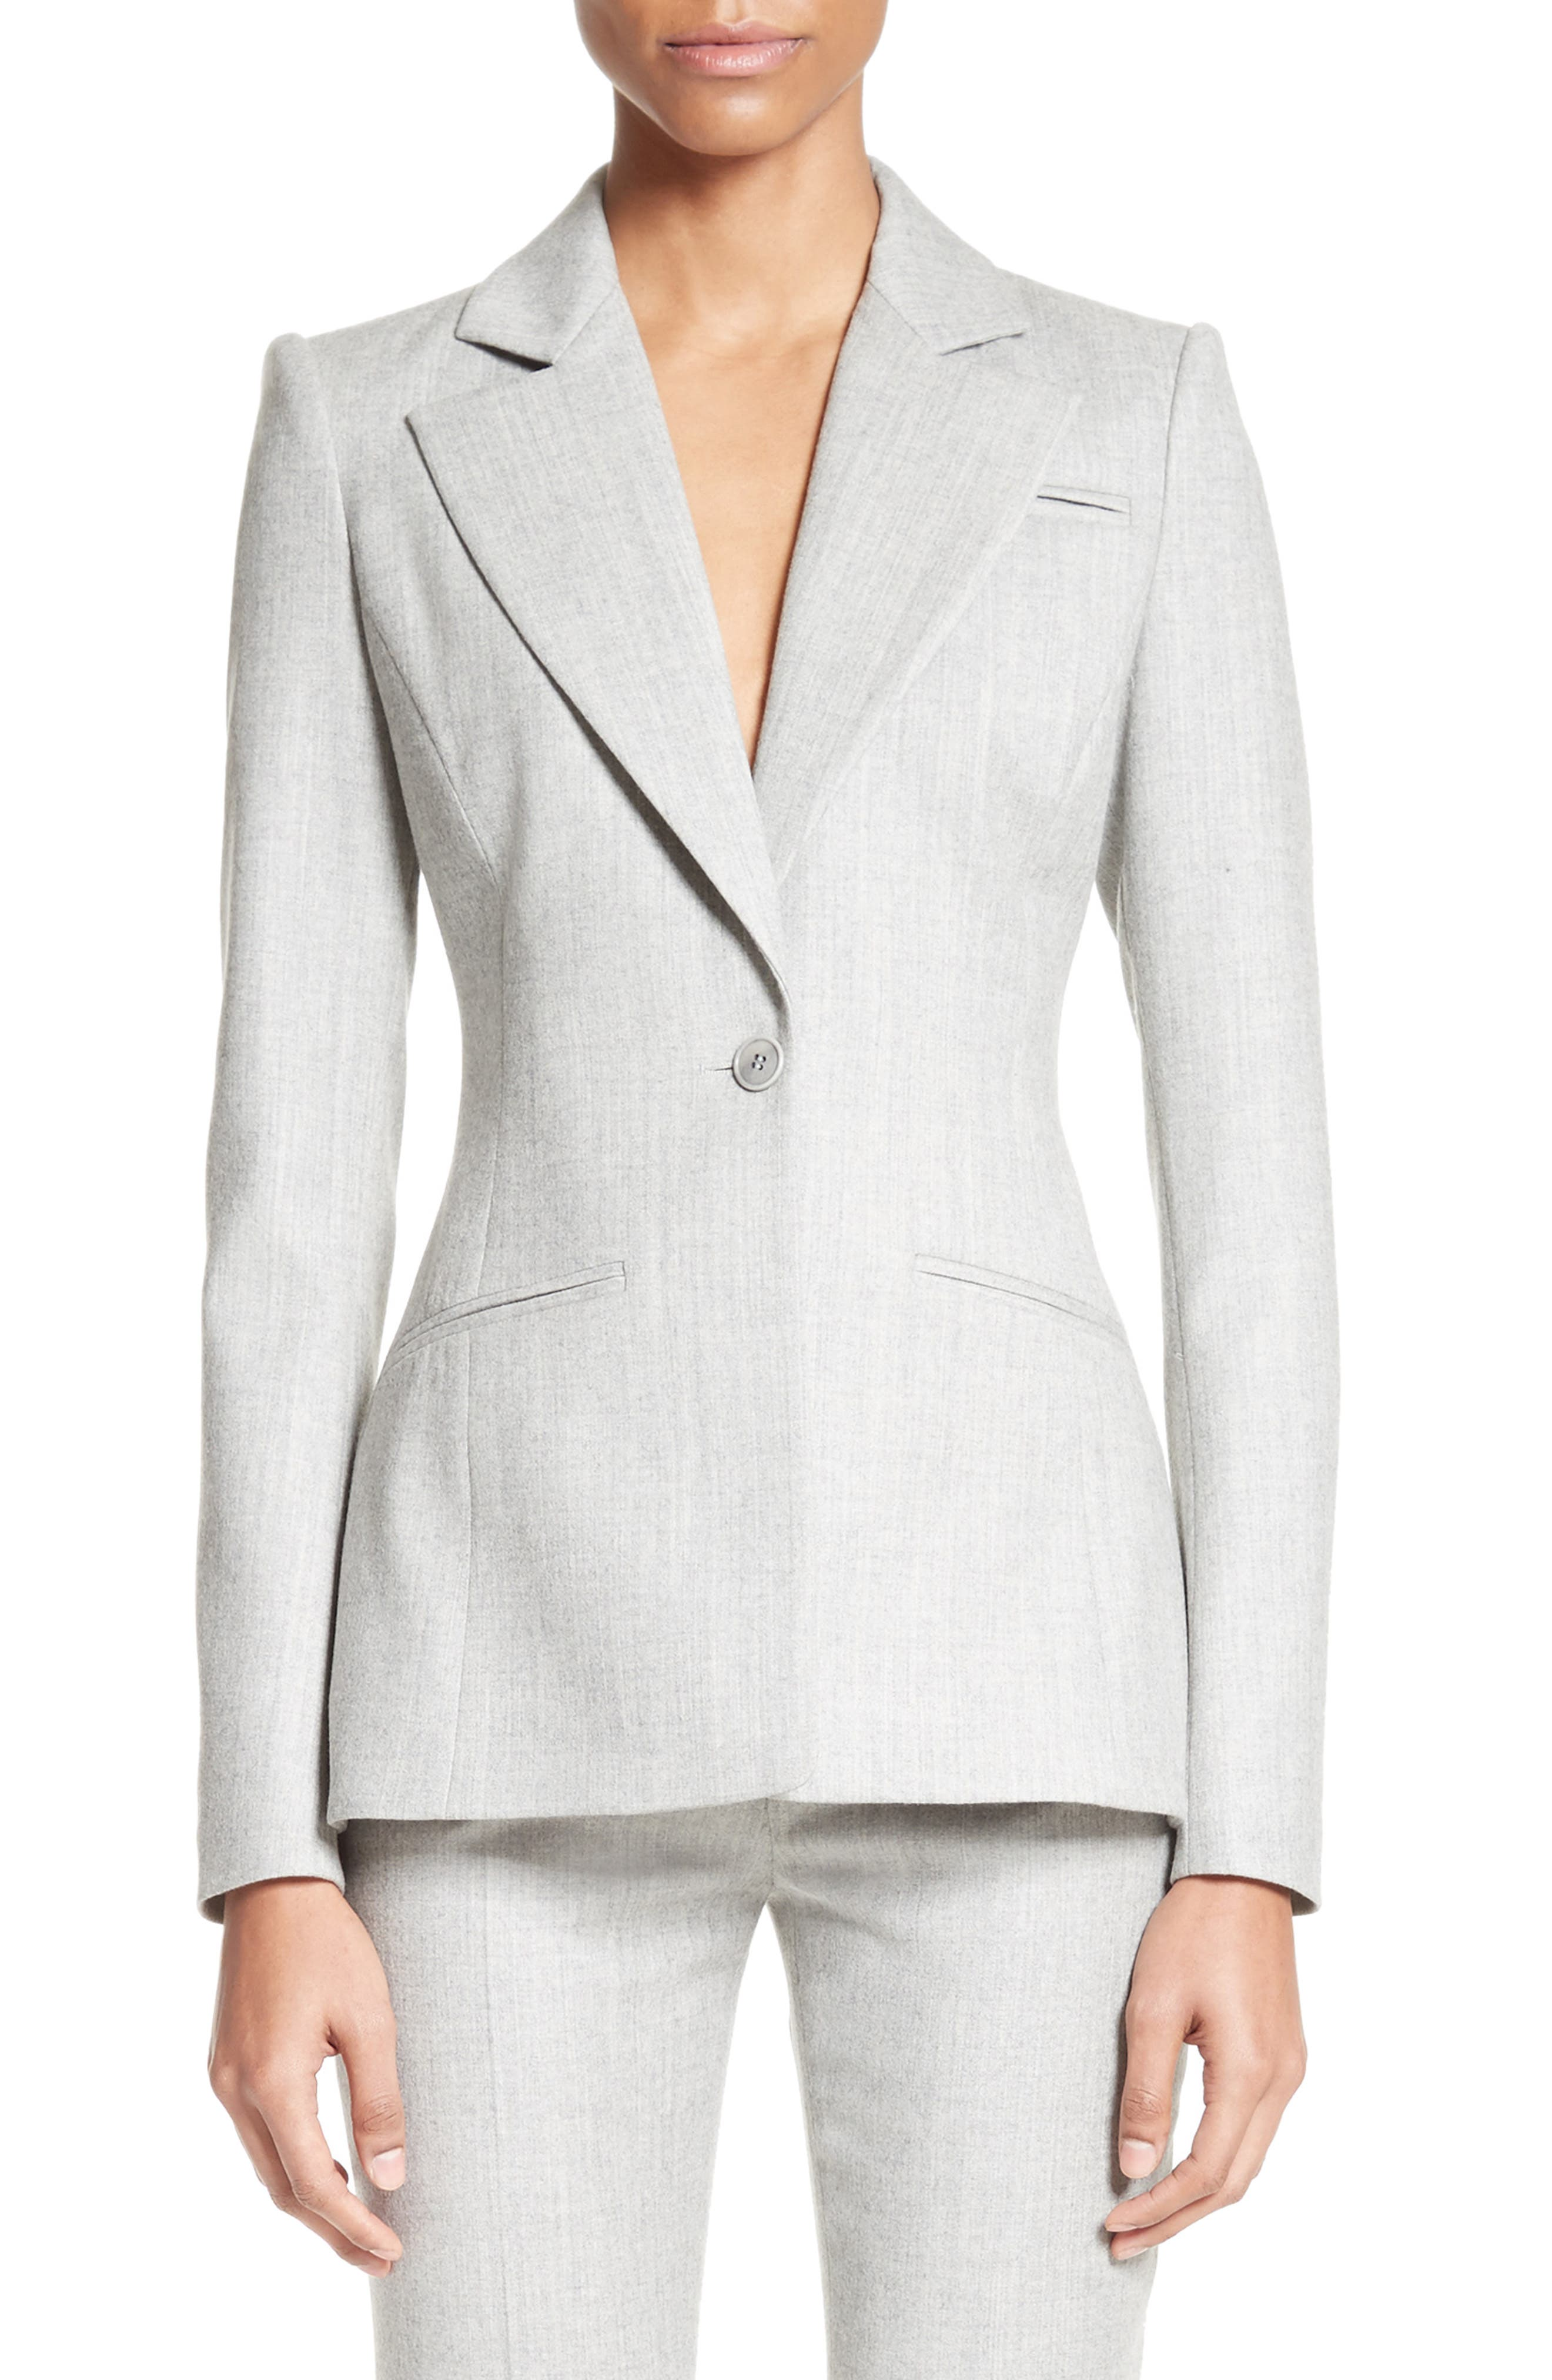 Altuzarra Acacia Stretch Wool Jacket